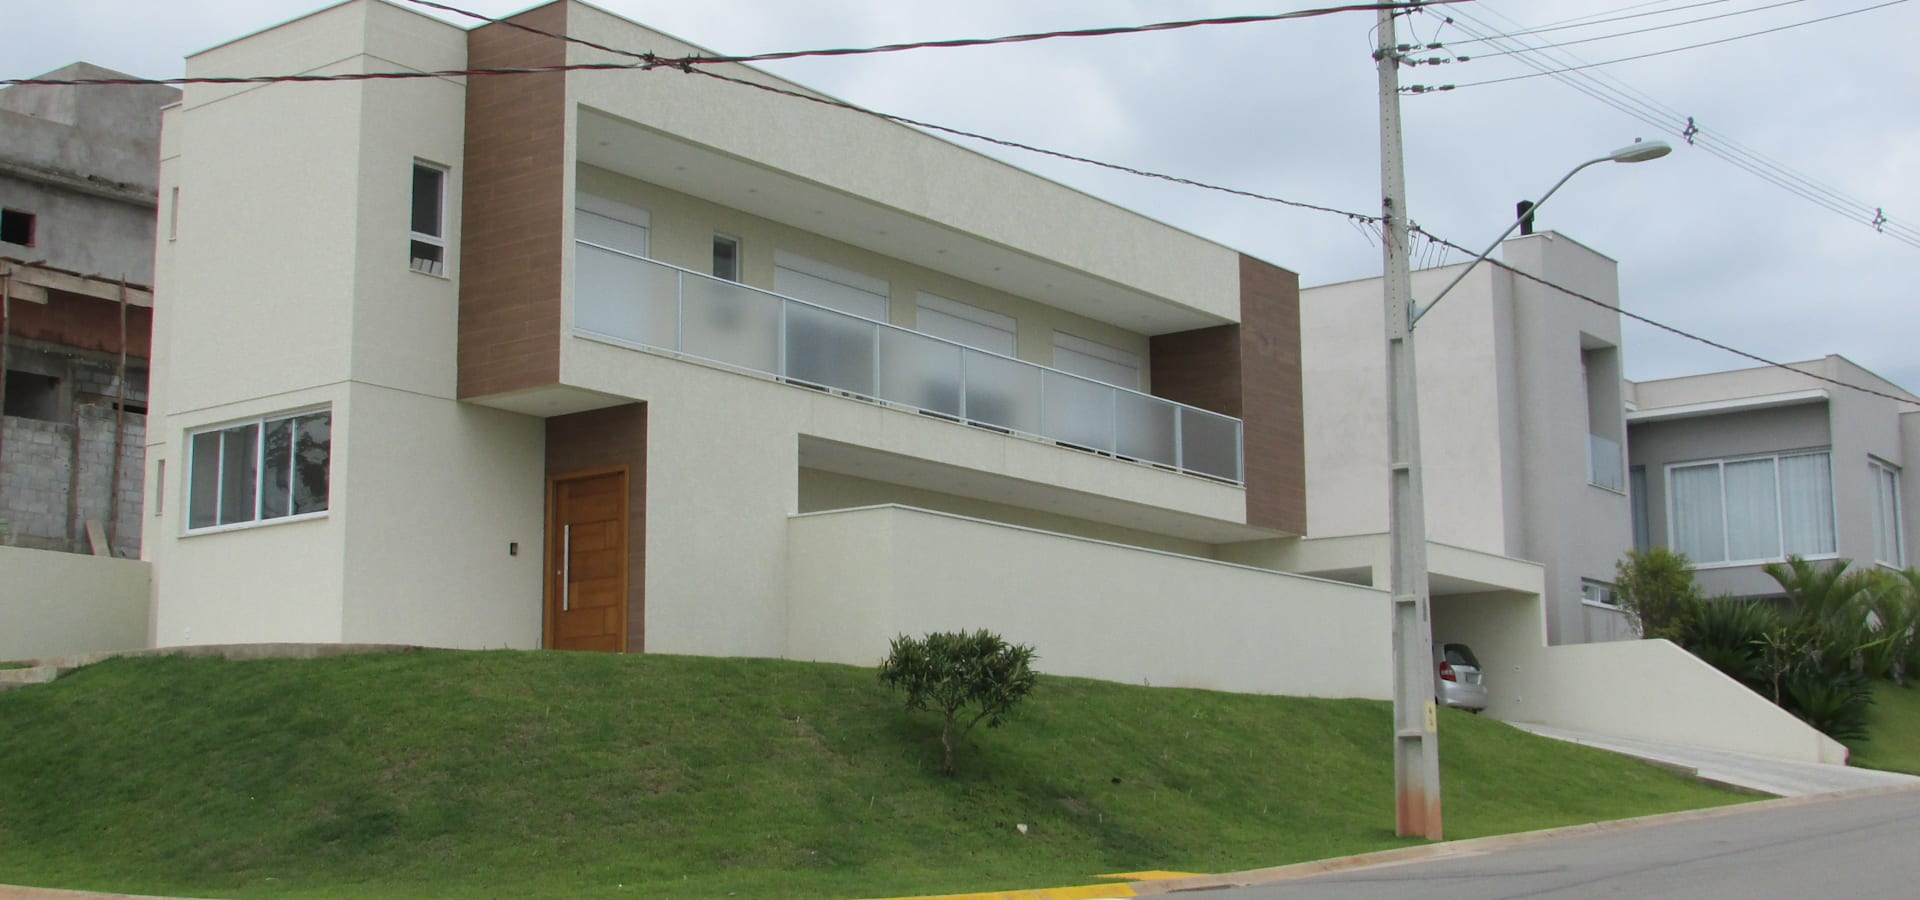 rosalima arquitetura